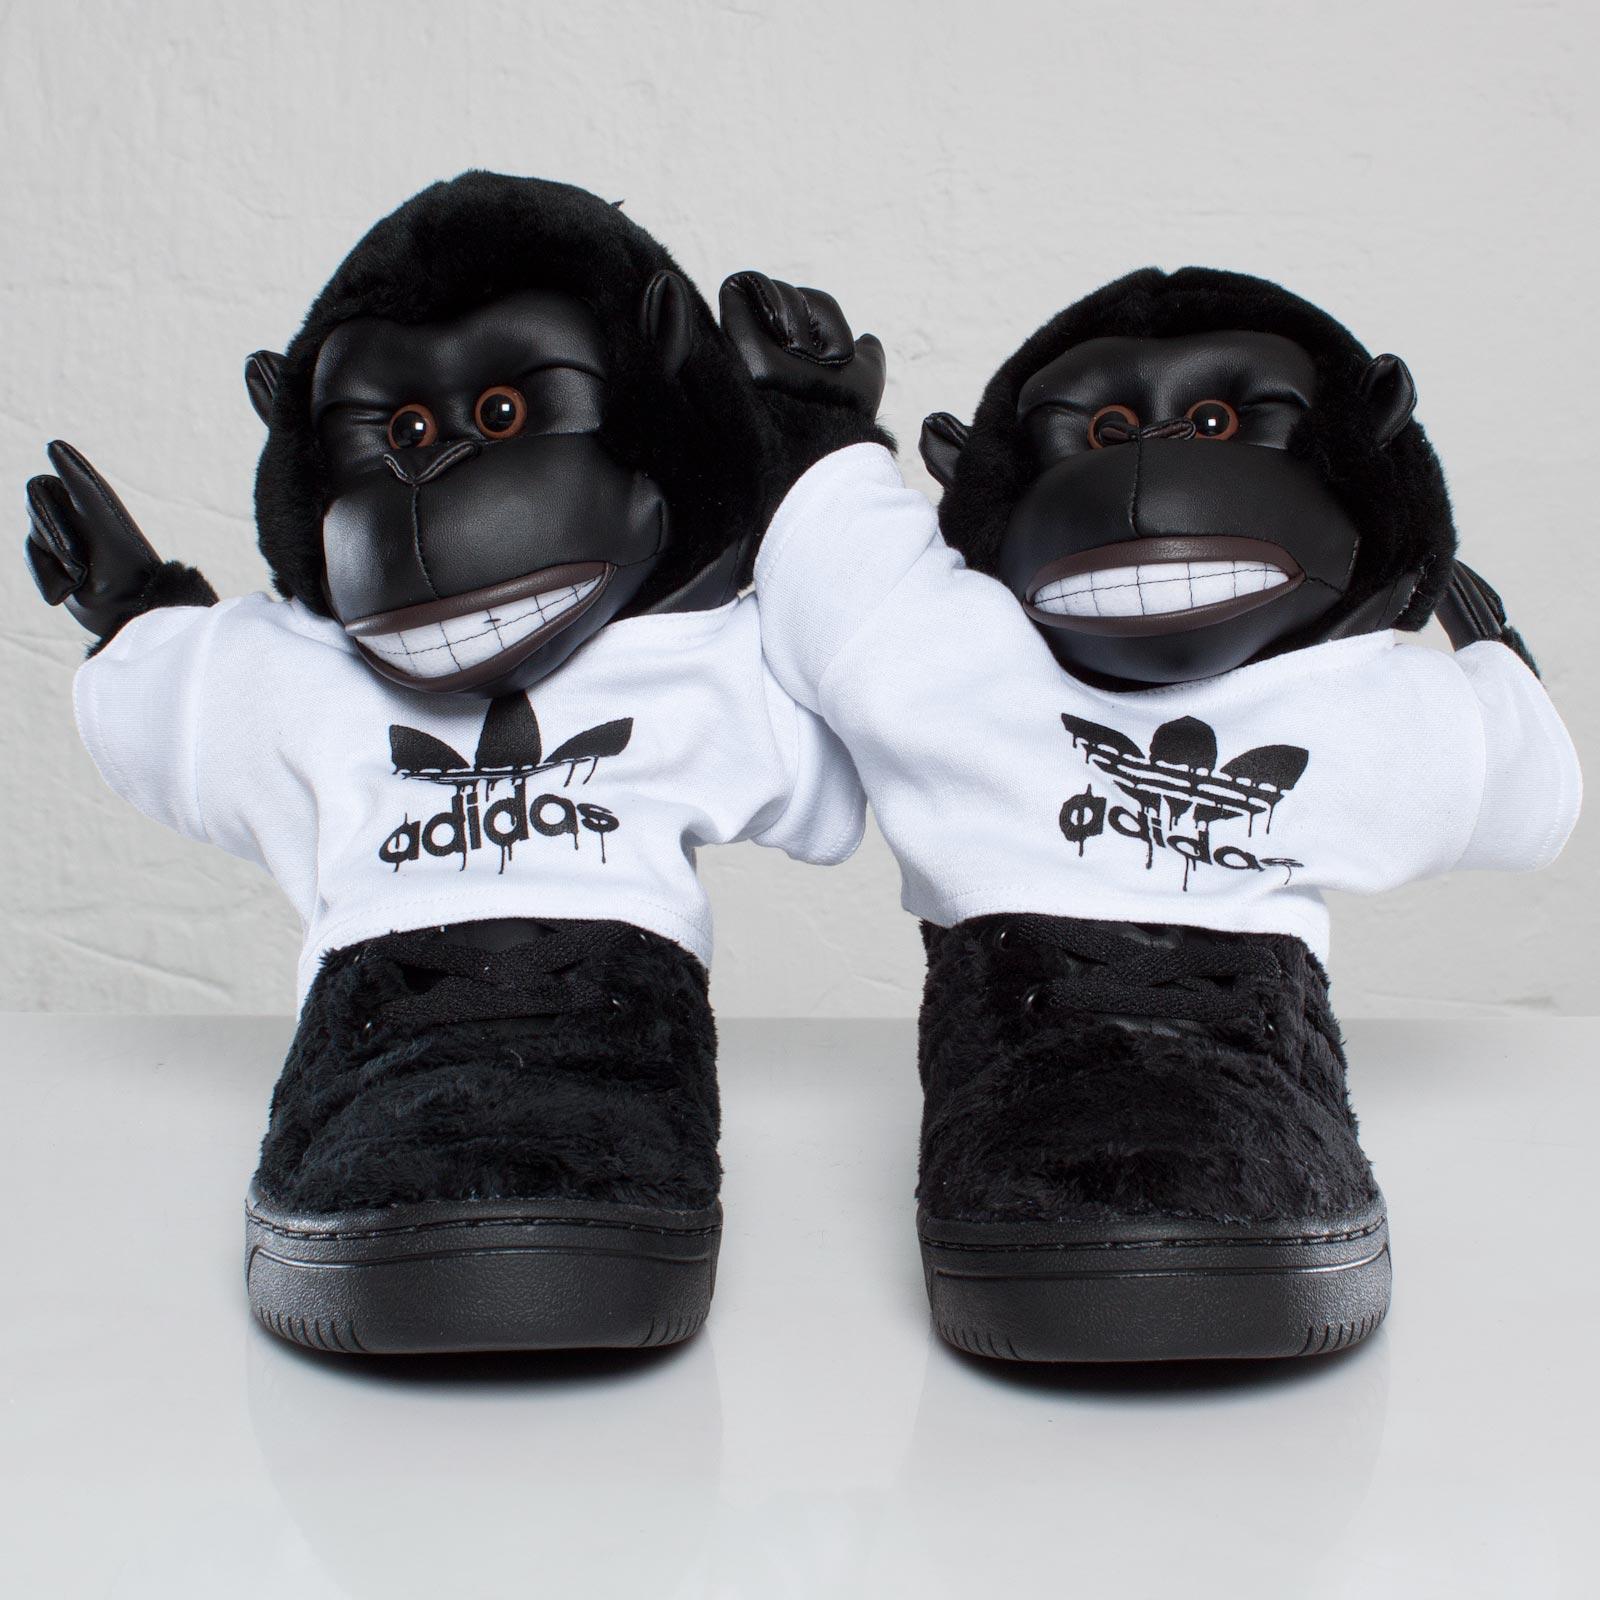 adidas JS Gorilla - 109652